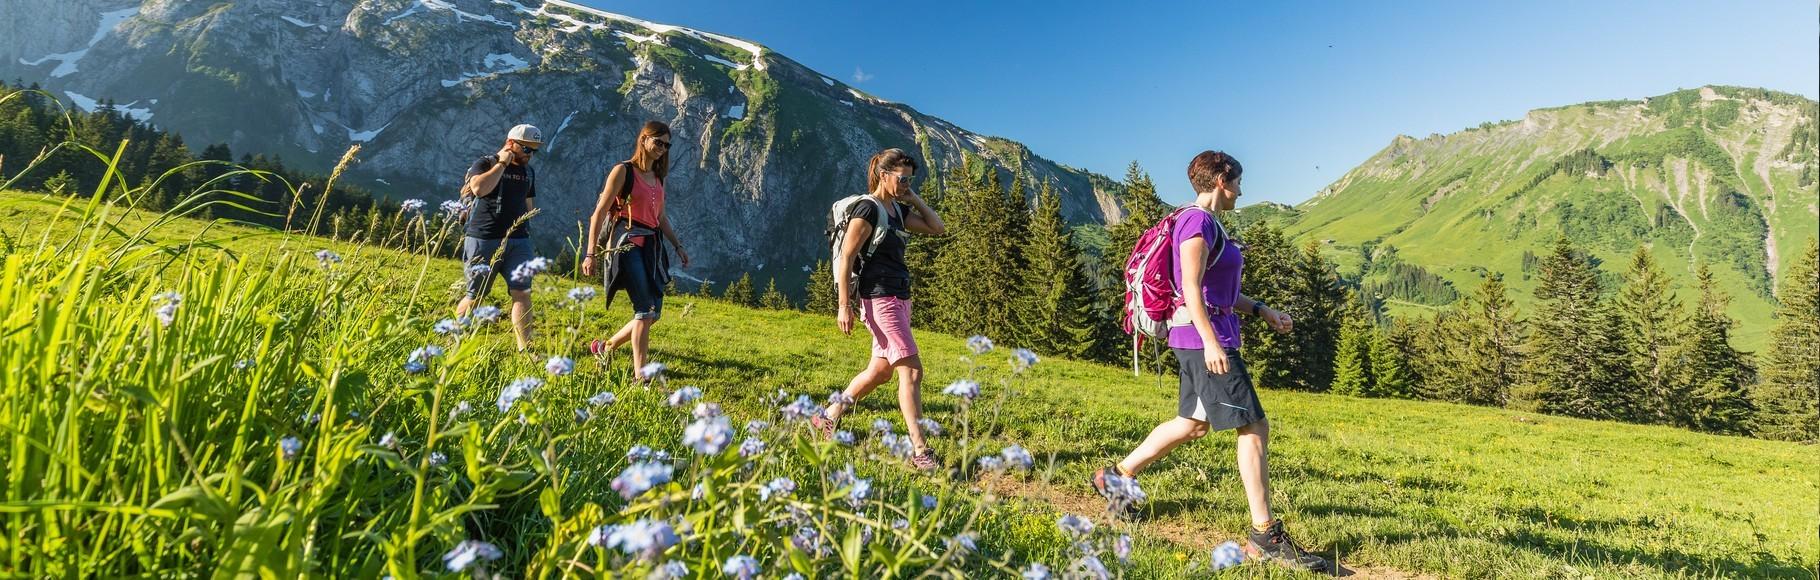 hike french alps morzine